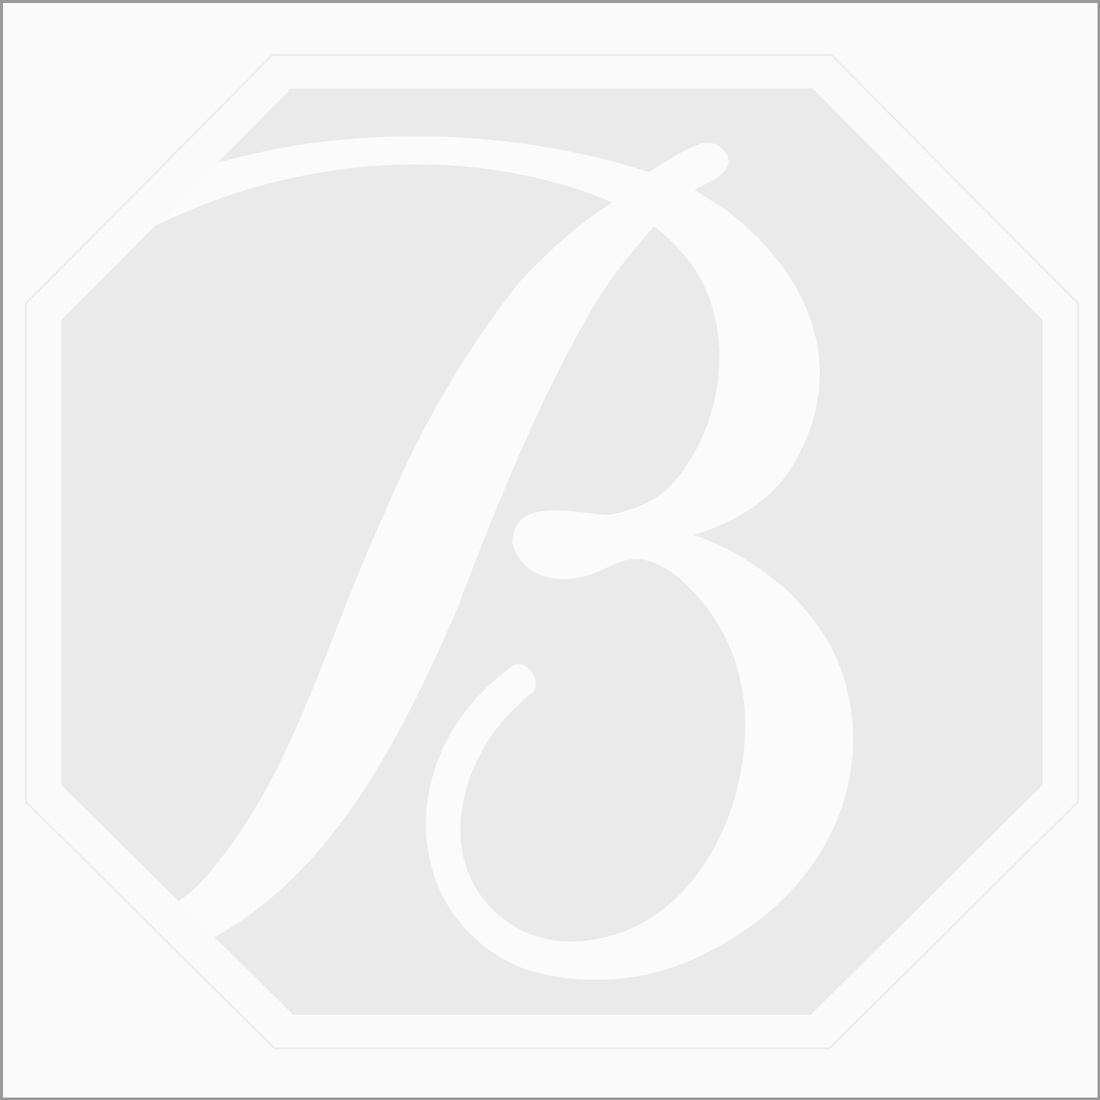 Black Diamond Cubes - 3 Lines - 116.00 carats (BDiaCu1001)